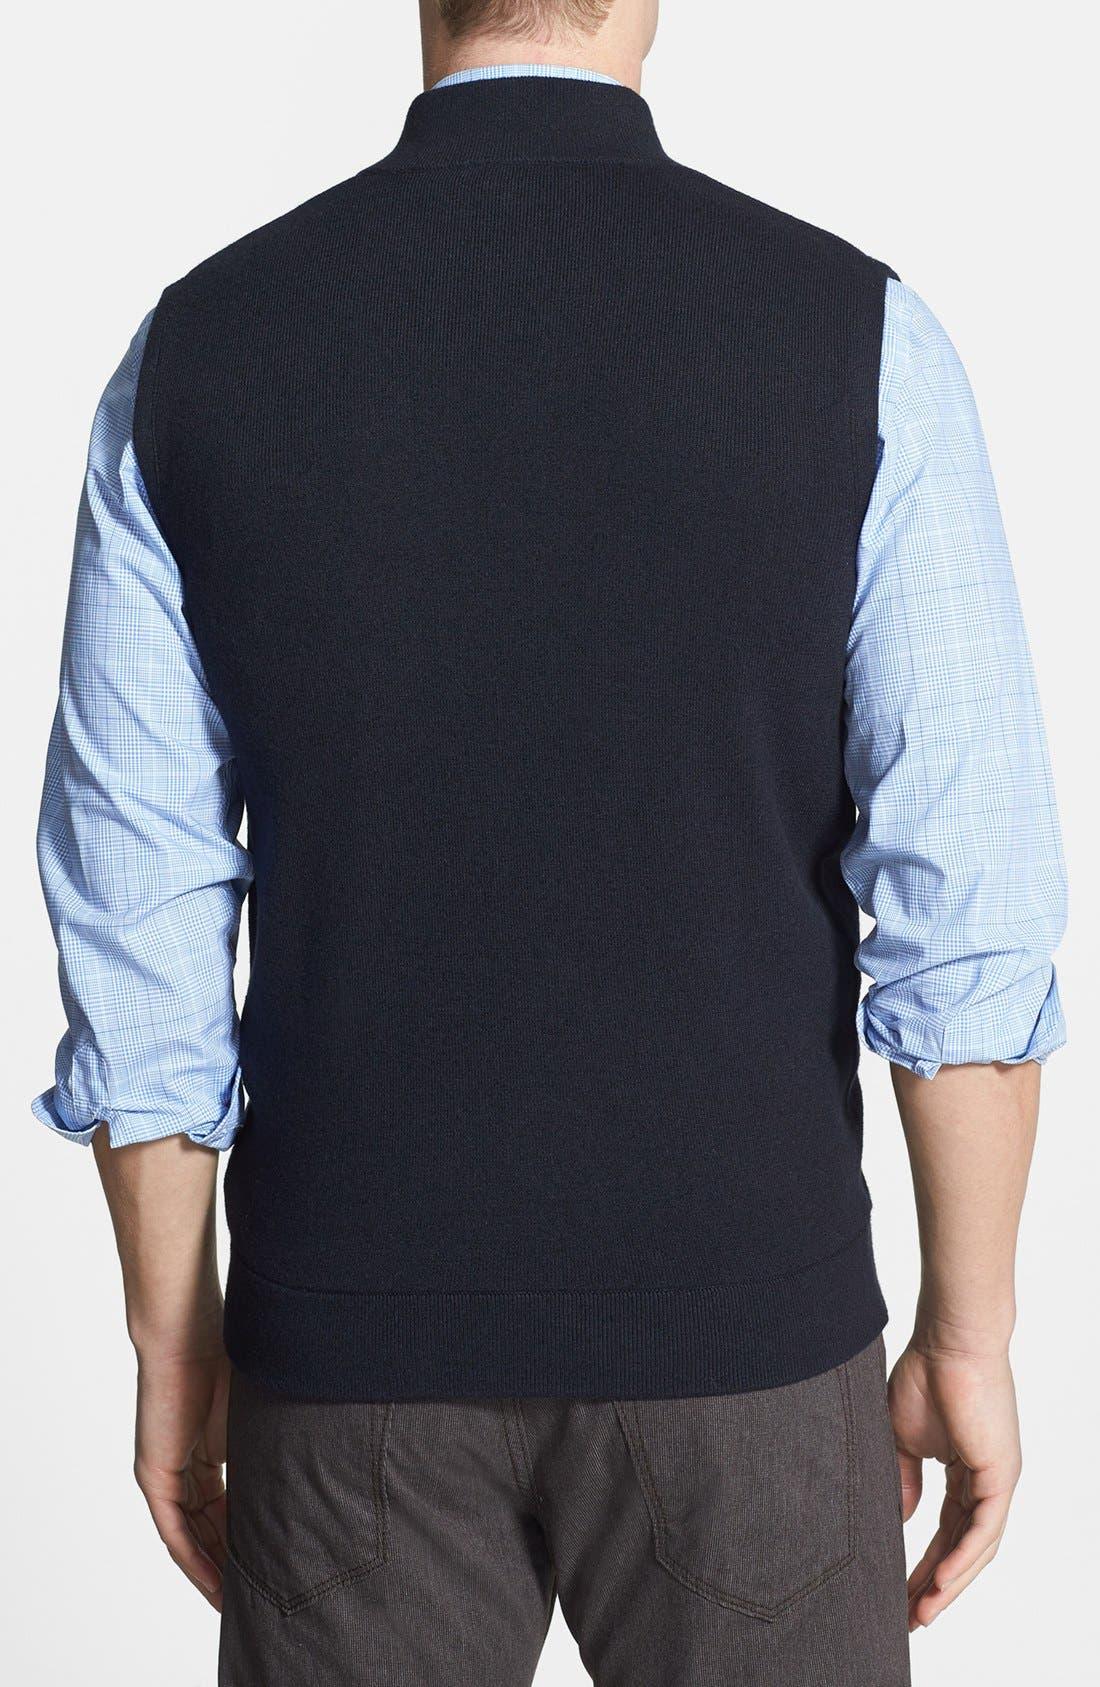 Alternate Image 2  - Façonnable Sweater Wool & Cotton Vest